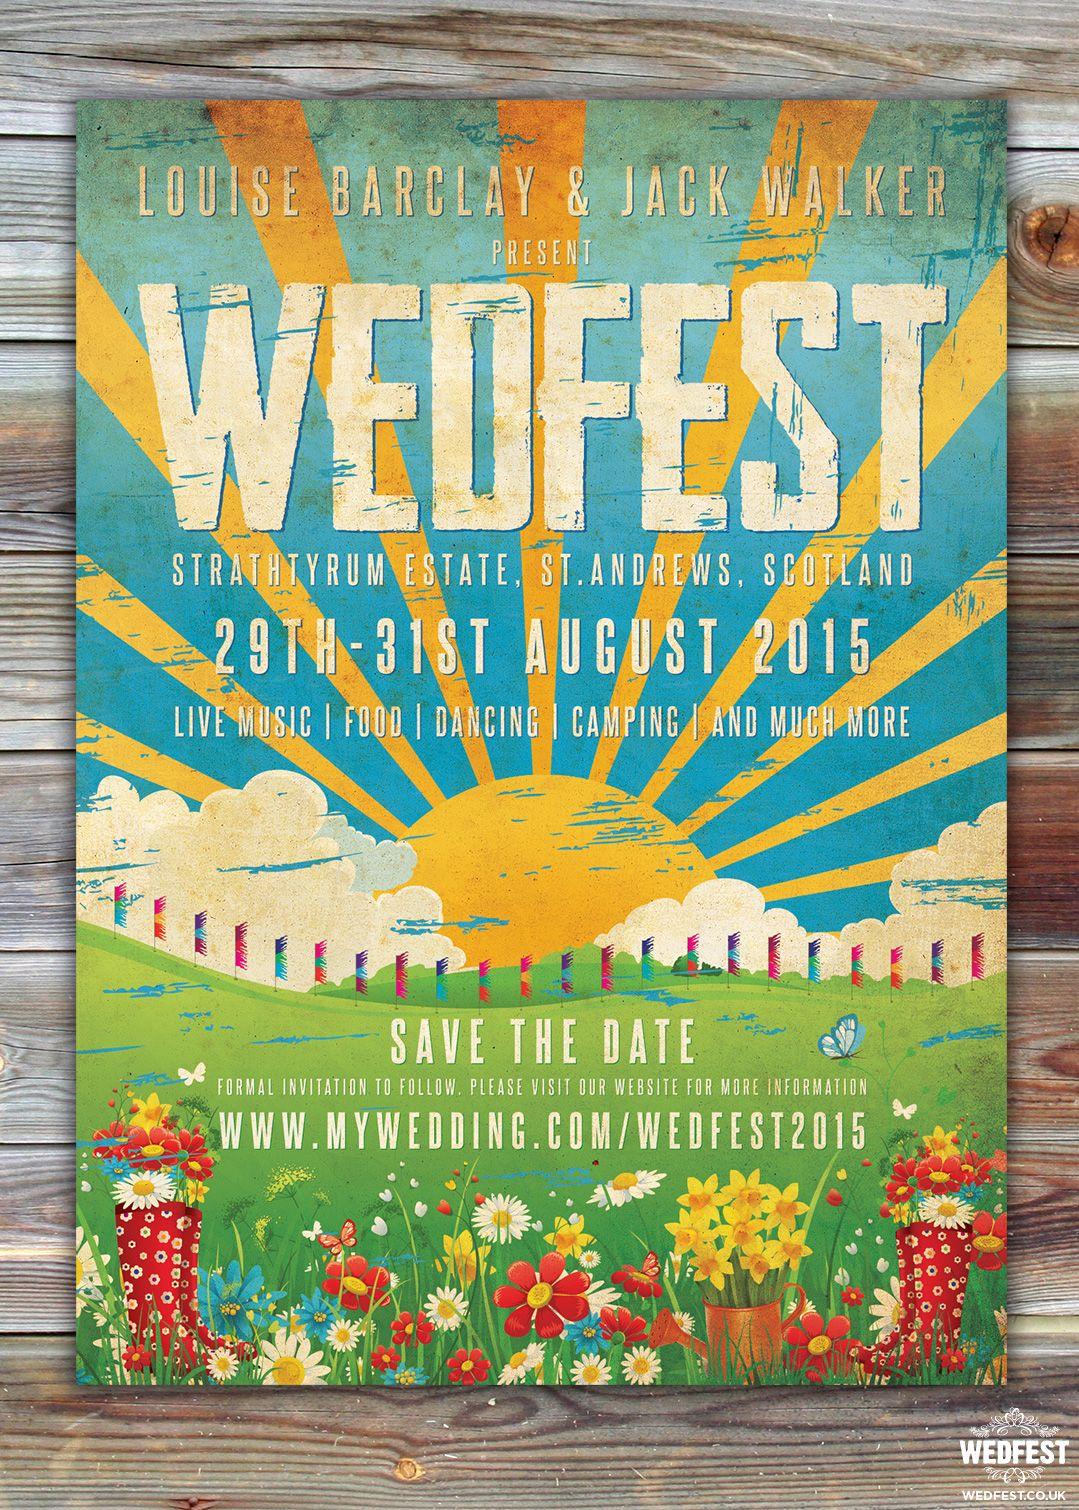 Wedfest poster wedding save the dates httpwedfestwedding wedfest poster wedding save the dates httpwedfest stopboris Choice Image